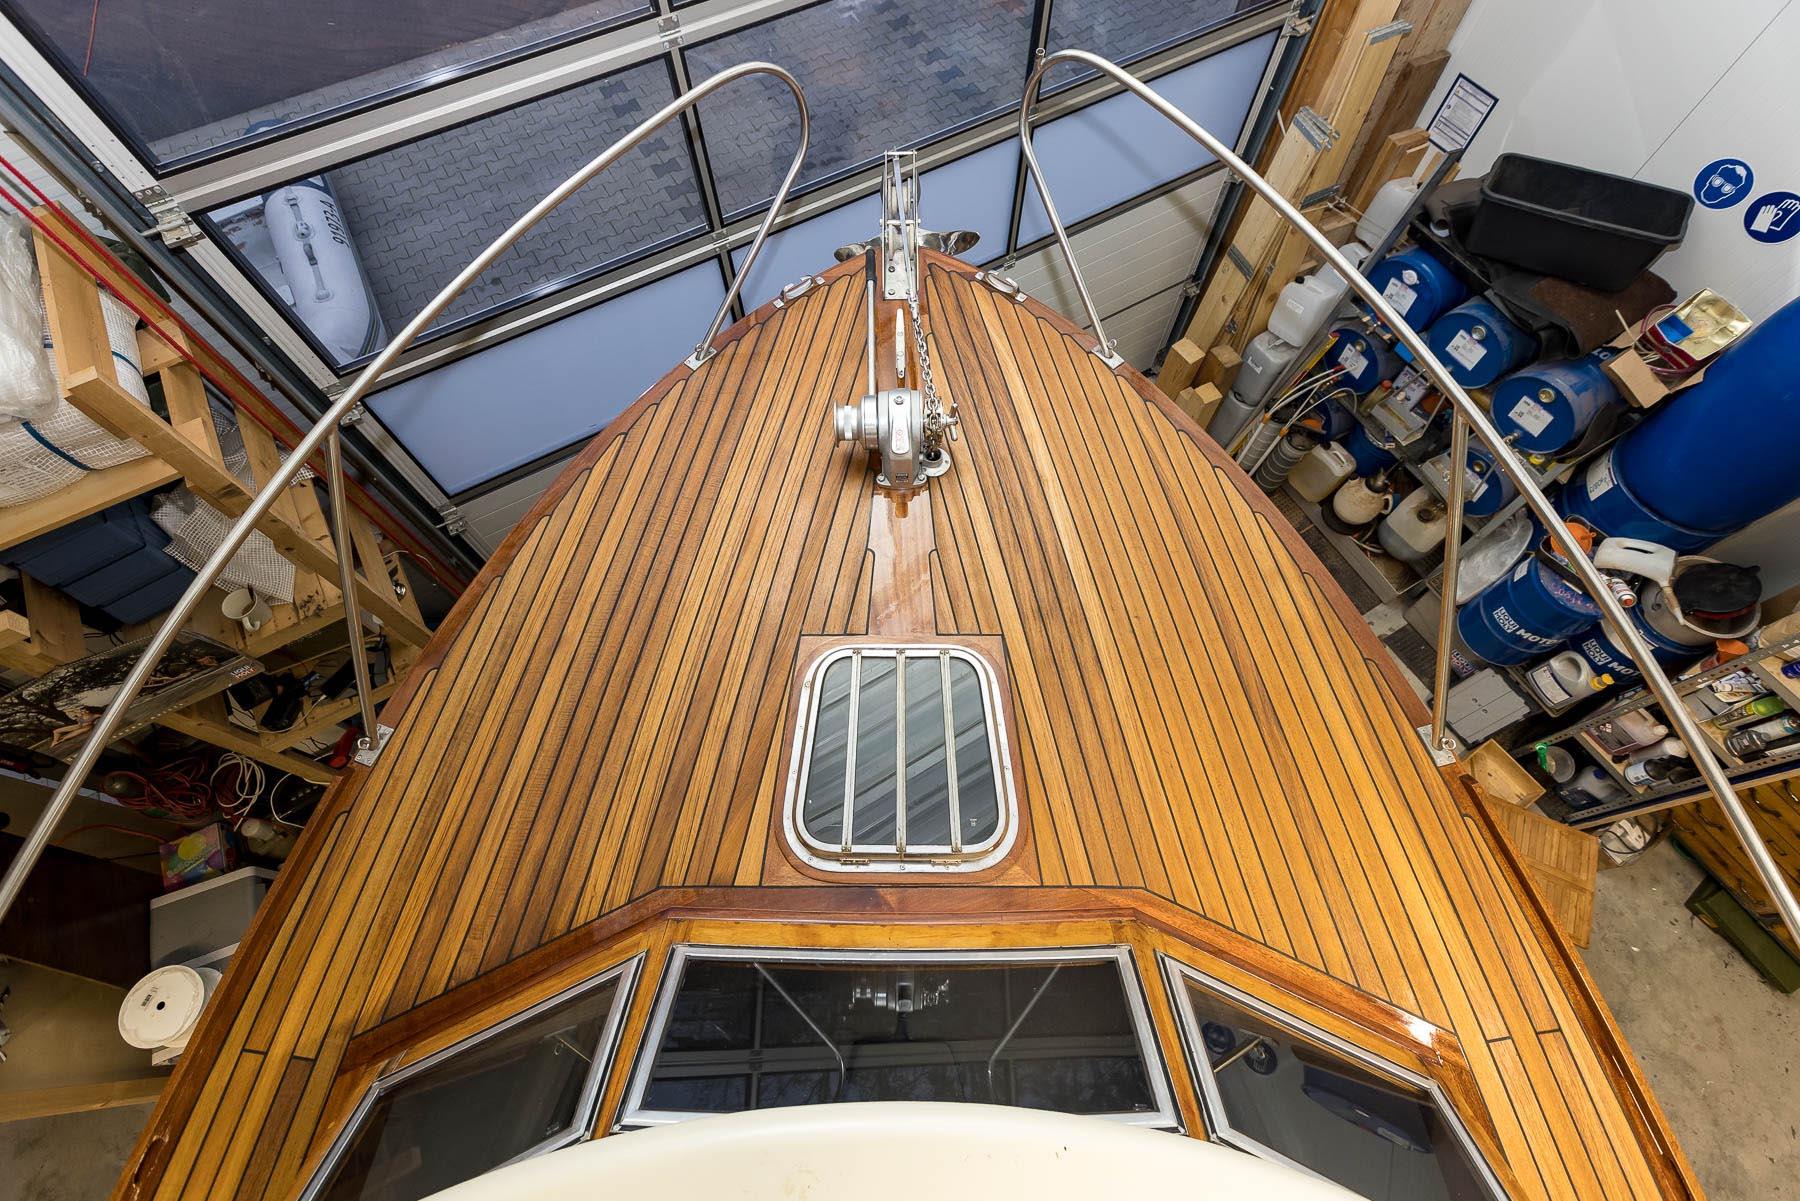 Teakdeck-Sanierung-Saisonbegleitung-Motoryacht-Anguilla-Norman-Bootsbau-Potsdam